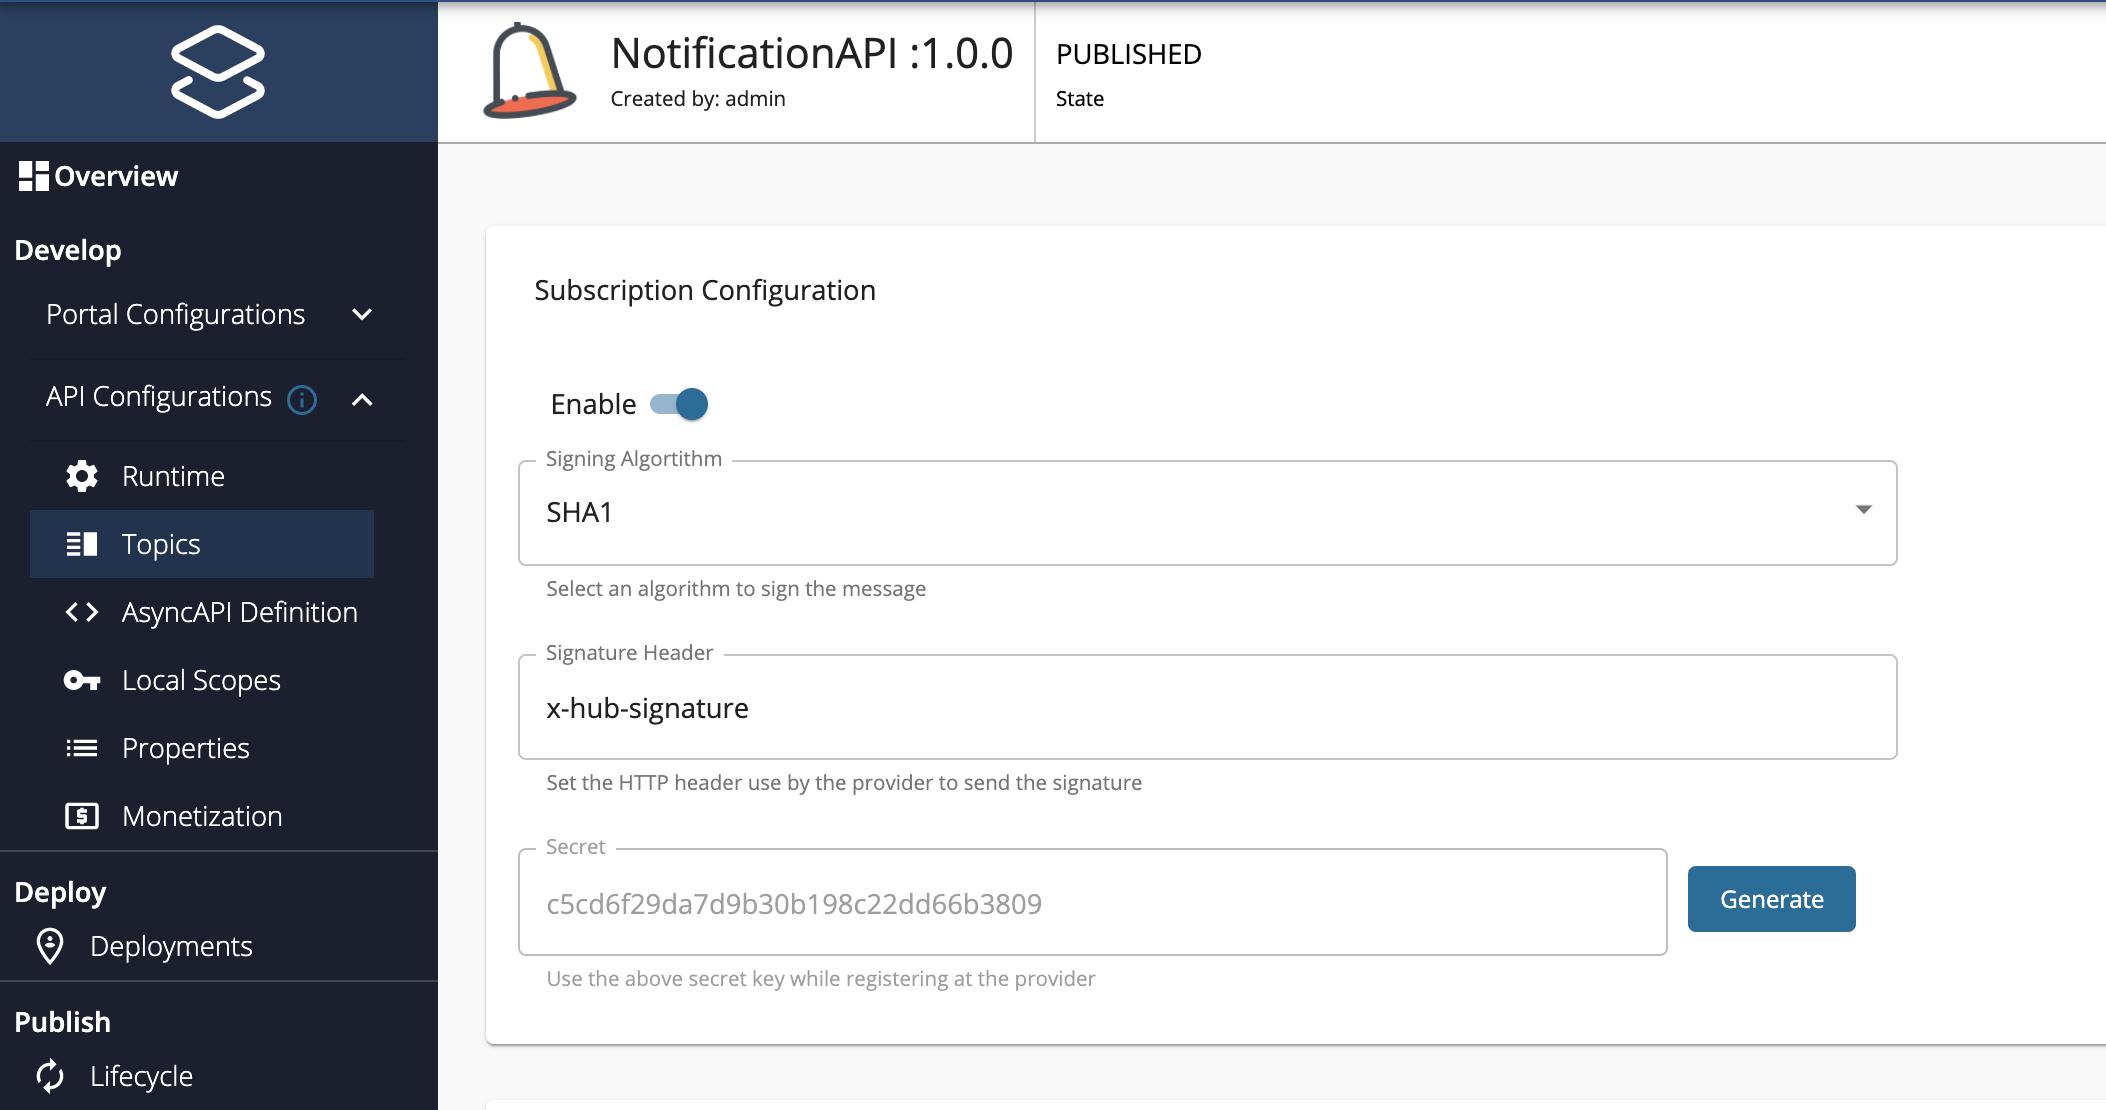 Subscription Configuration